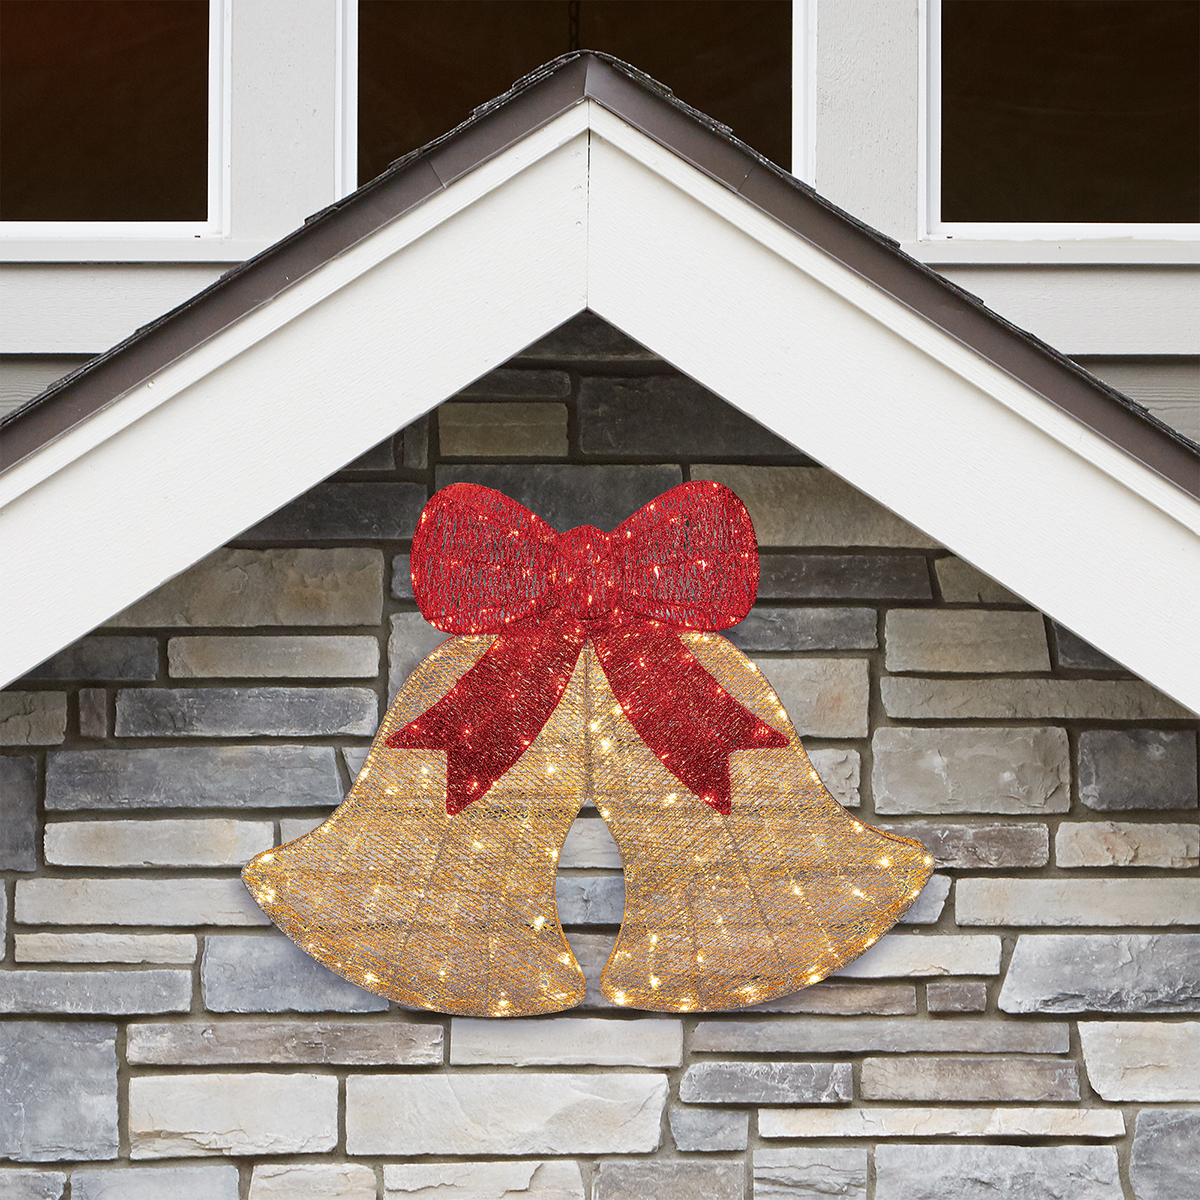 30 Inch 78 Cm Indoor Outdoor Christmas Glitter Bells With 200 Led Lights Costco Uk